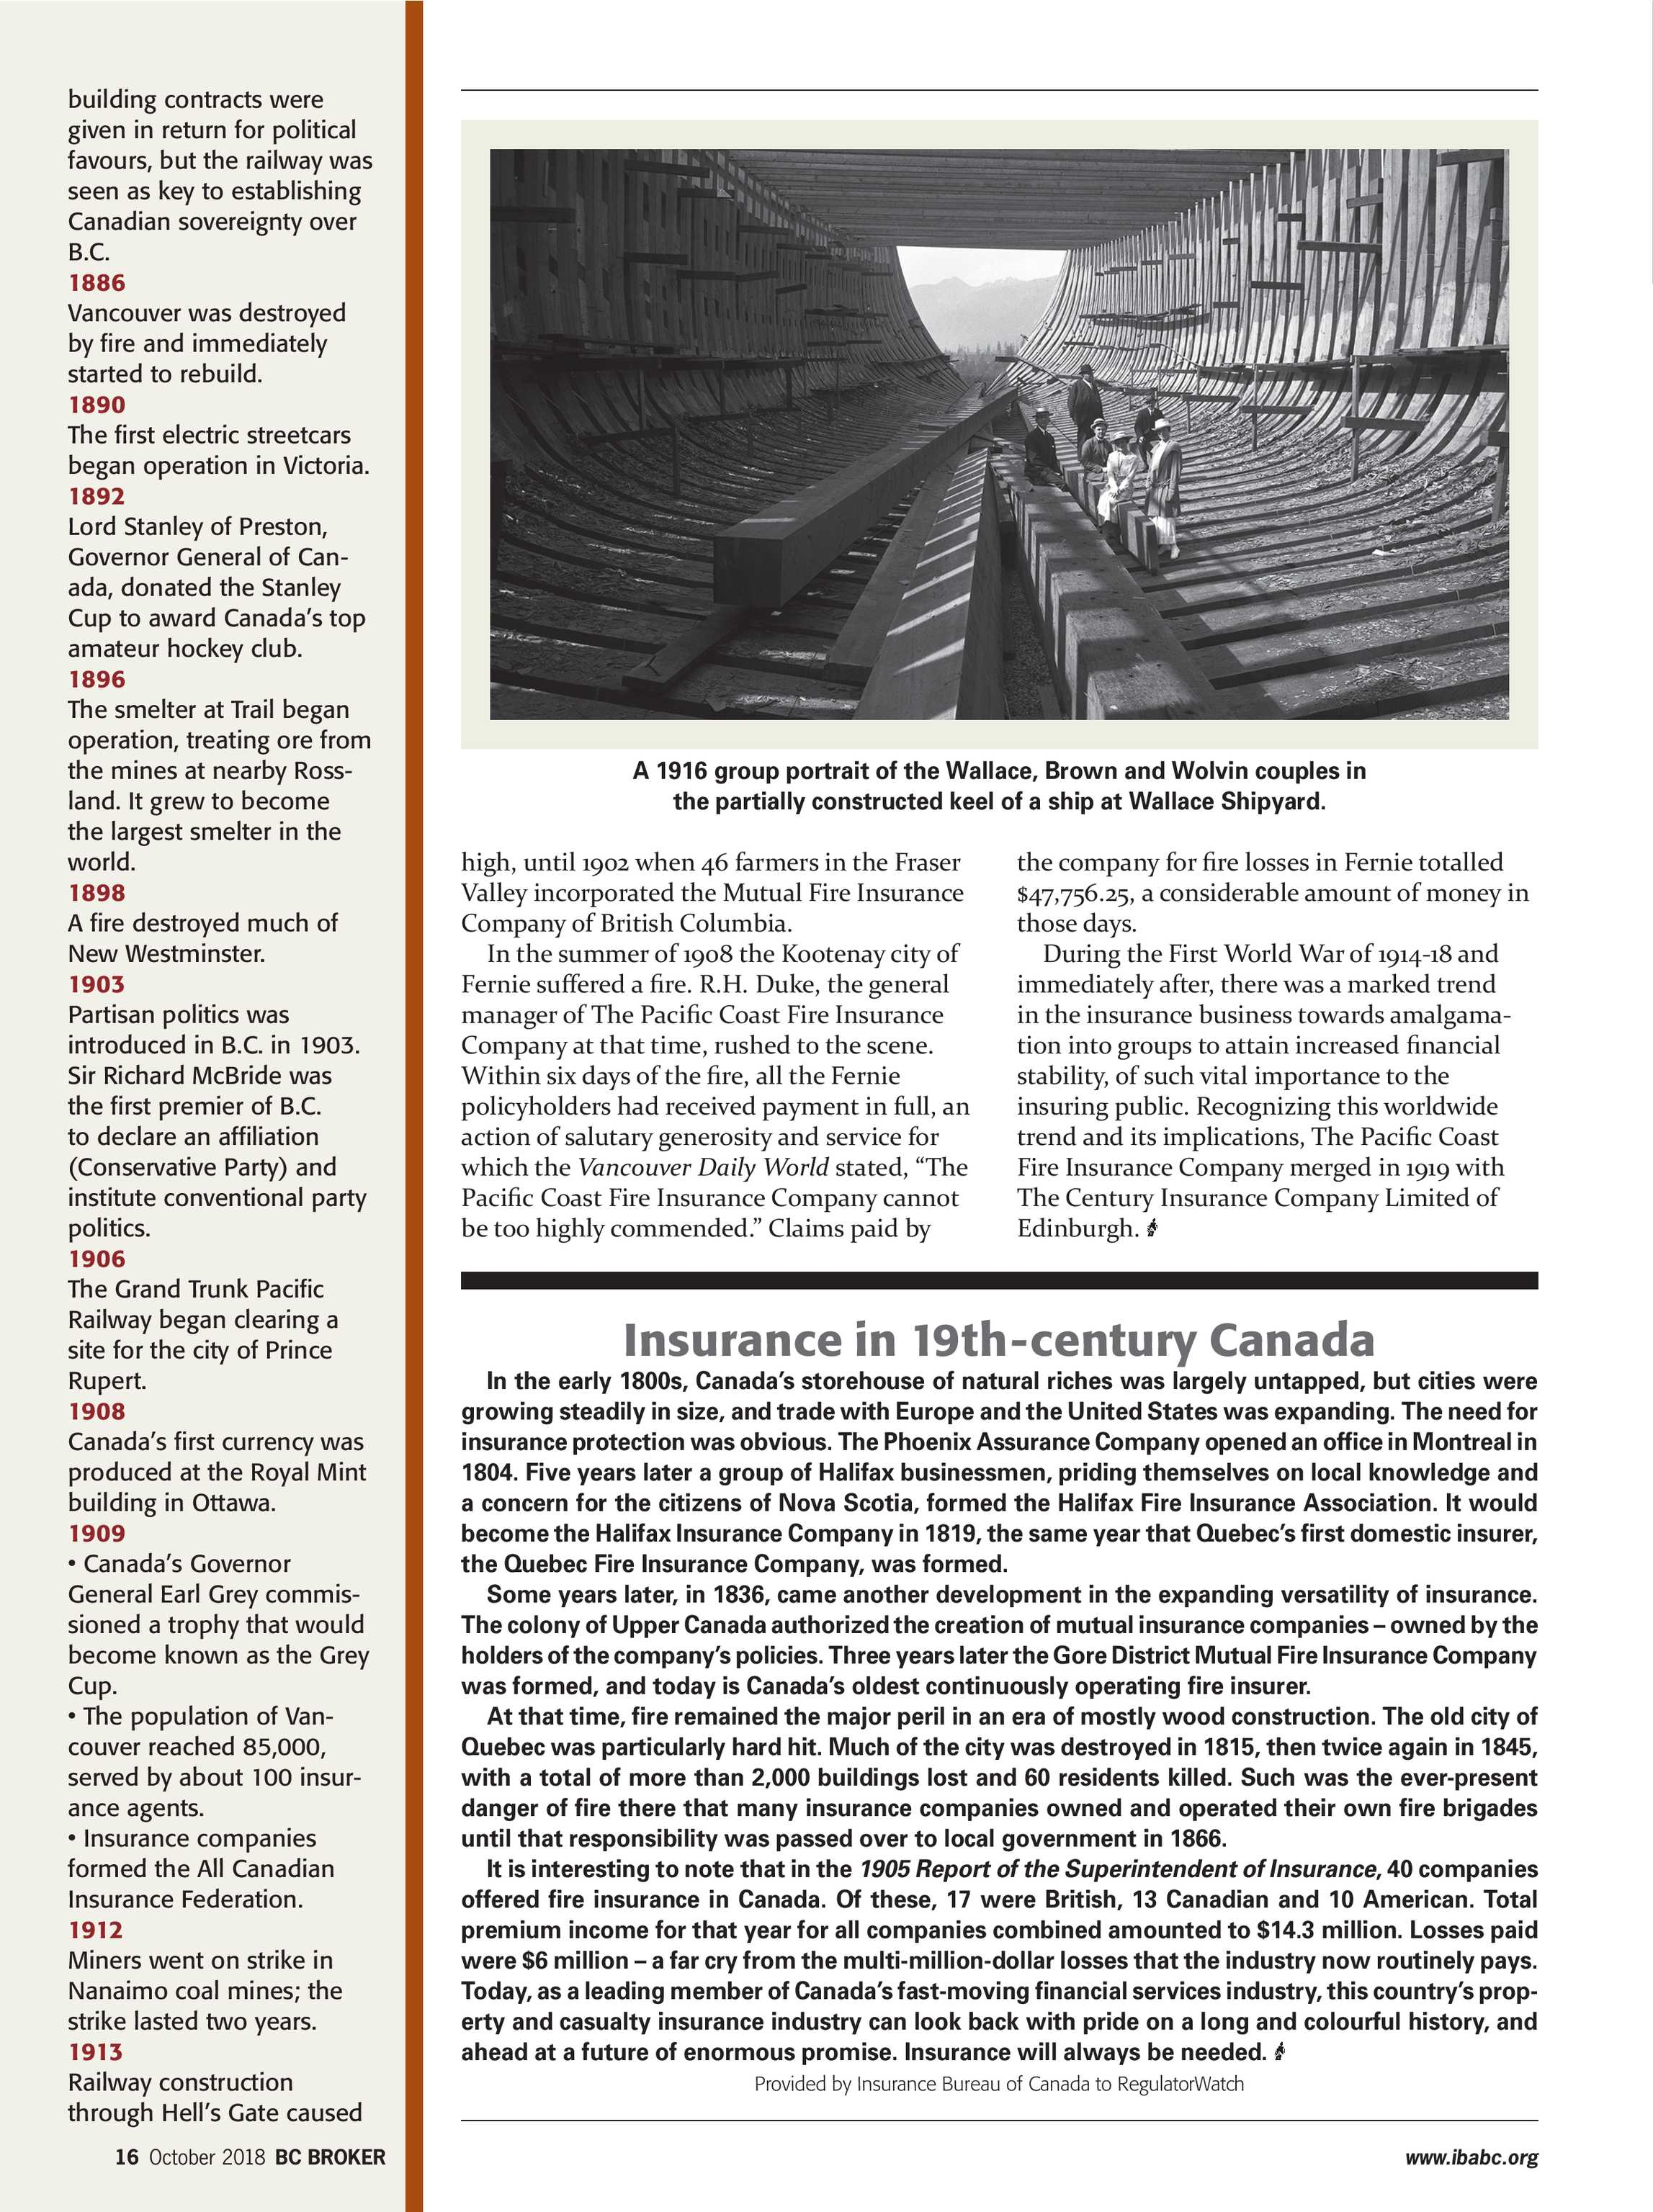 BC Broker - October 2018 - page 17